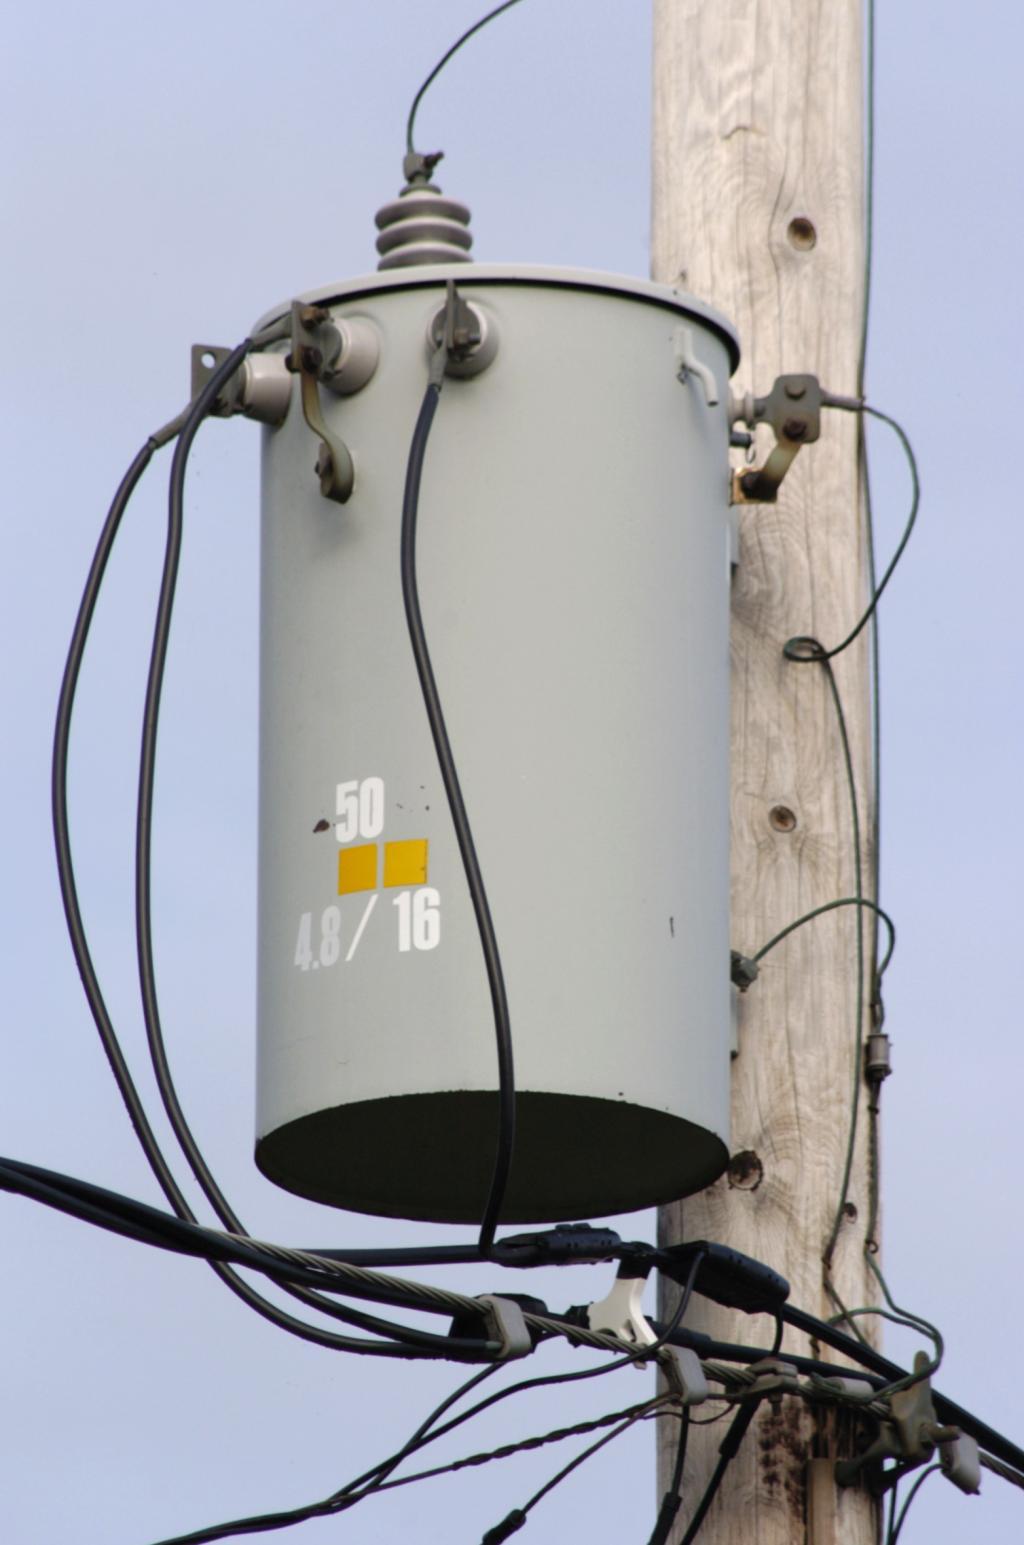 3 phase delta wye transformer wiring diagram get free